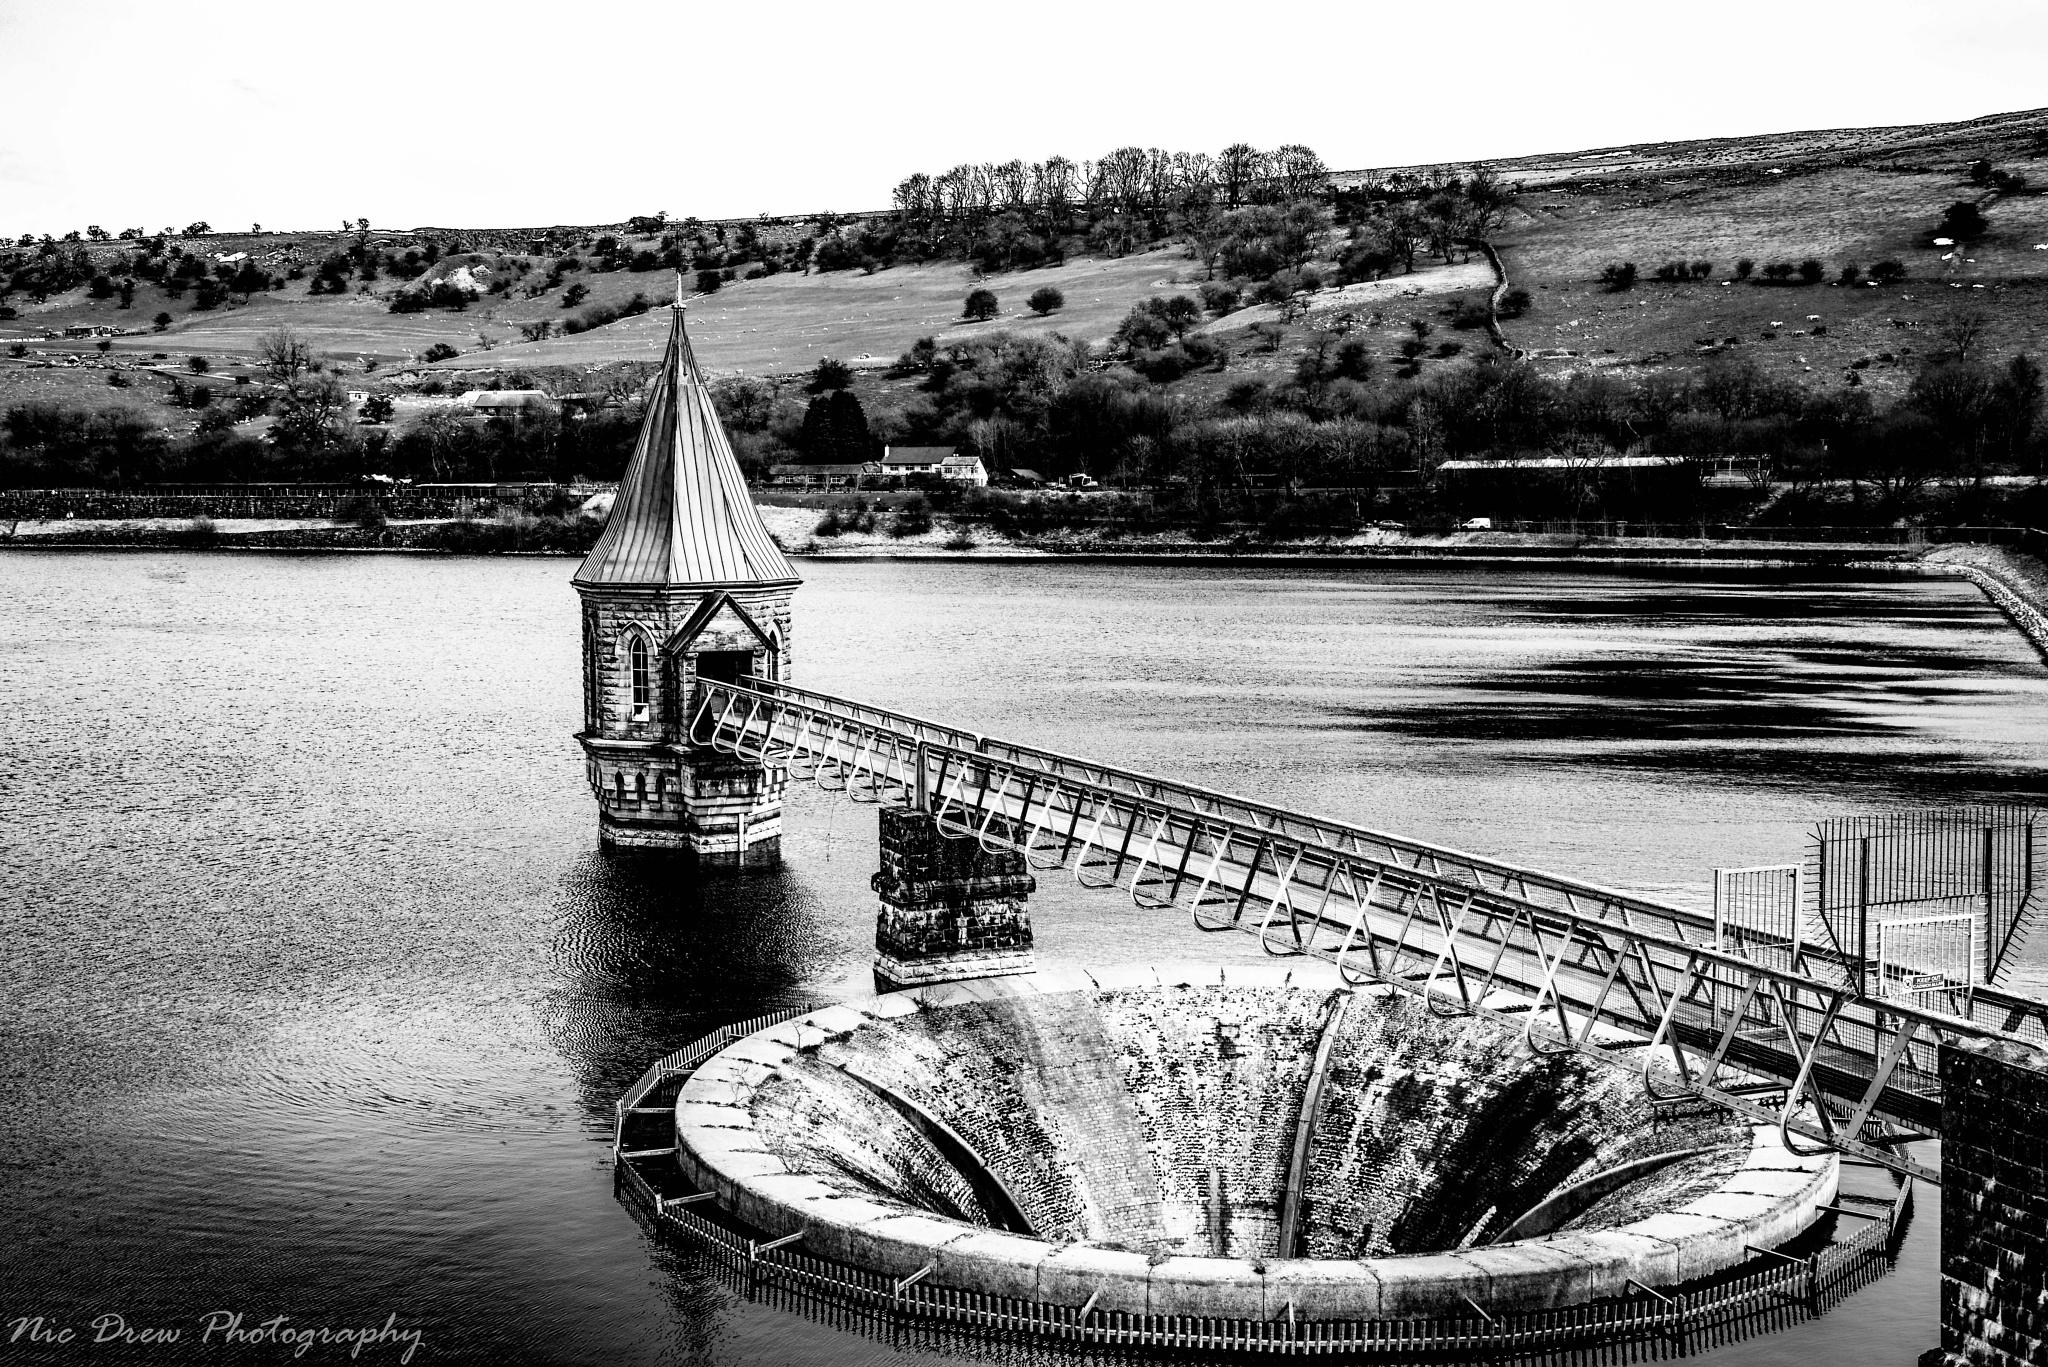 Reservoir overflow by Nic Drew